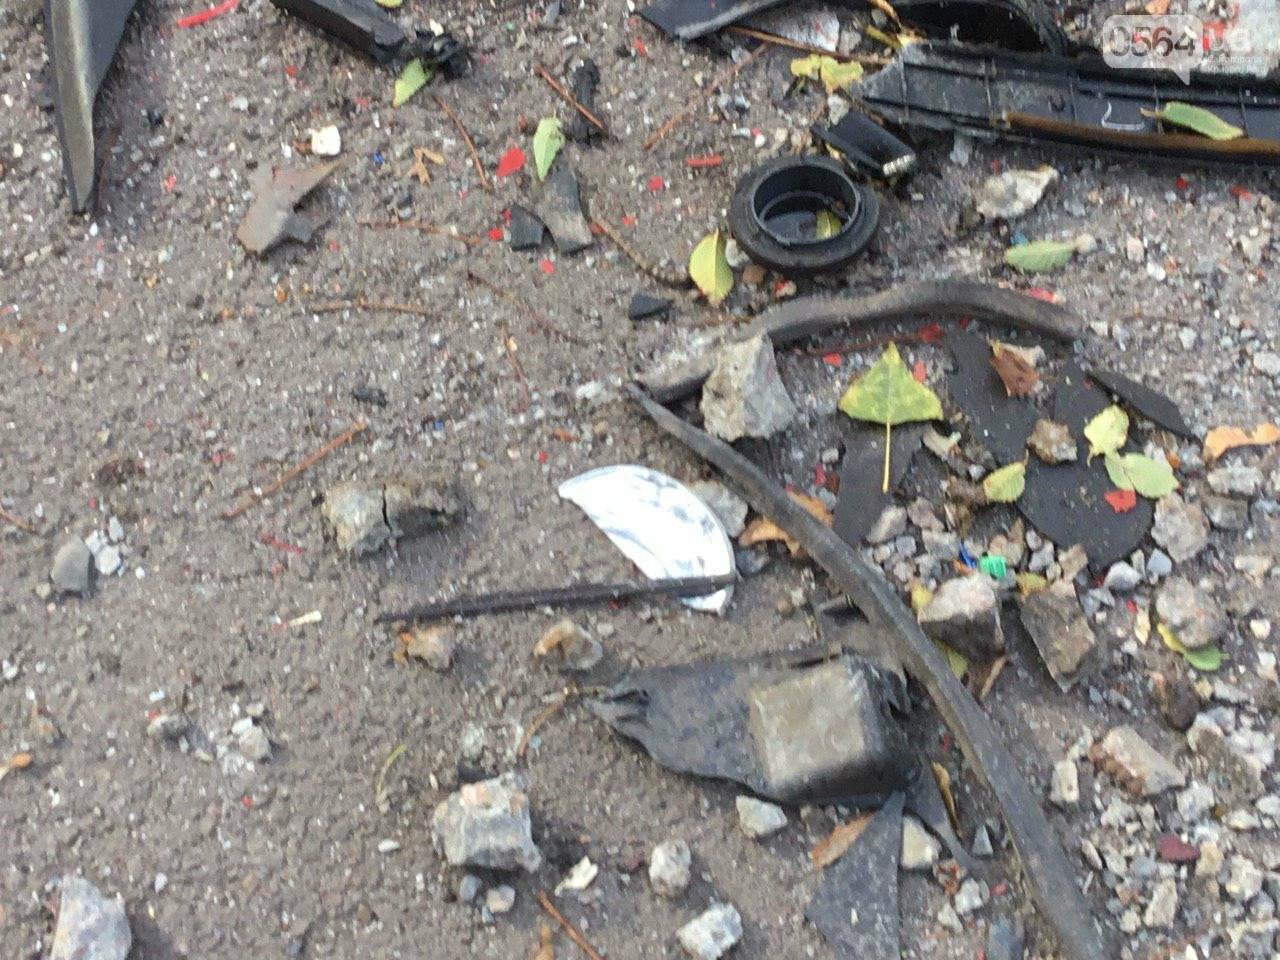 Куски стекла и обшивки разбившейся в Кривом Роге иномарки разлетелись на десятки метров, - ФОТО, фото-3